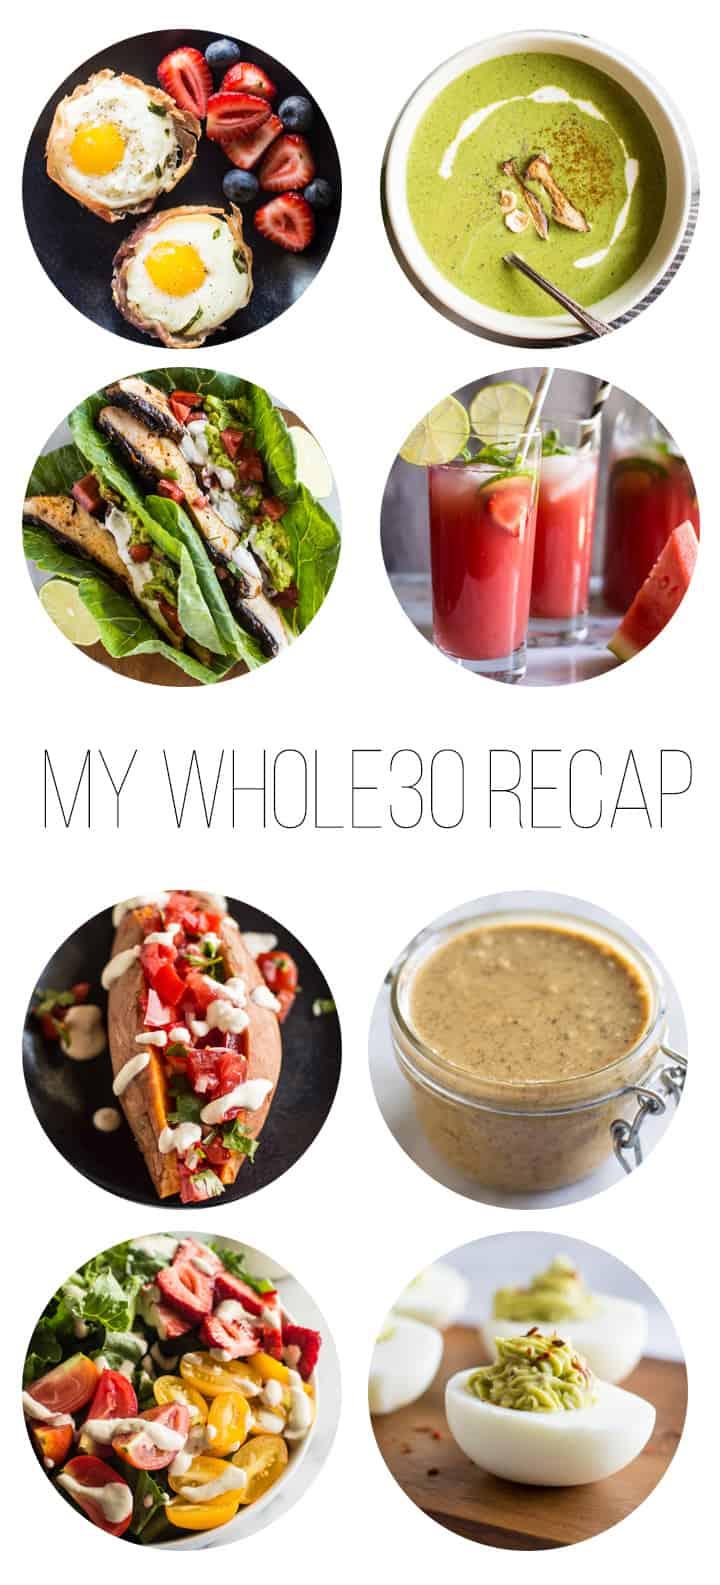 My Whole30 Recap | healthynibblesandbits.com